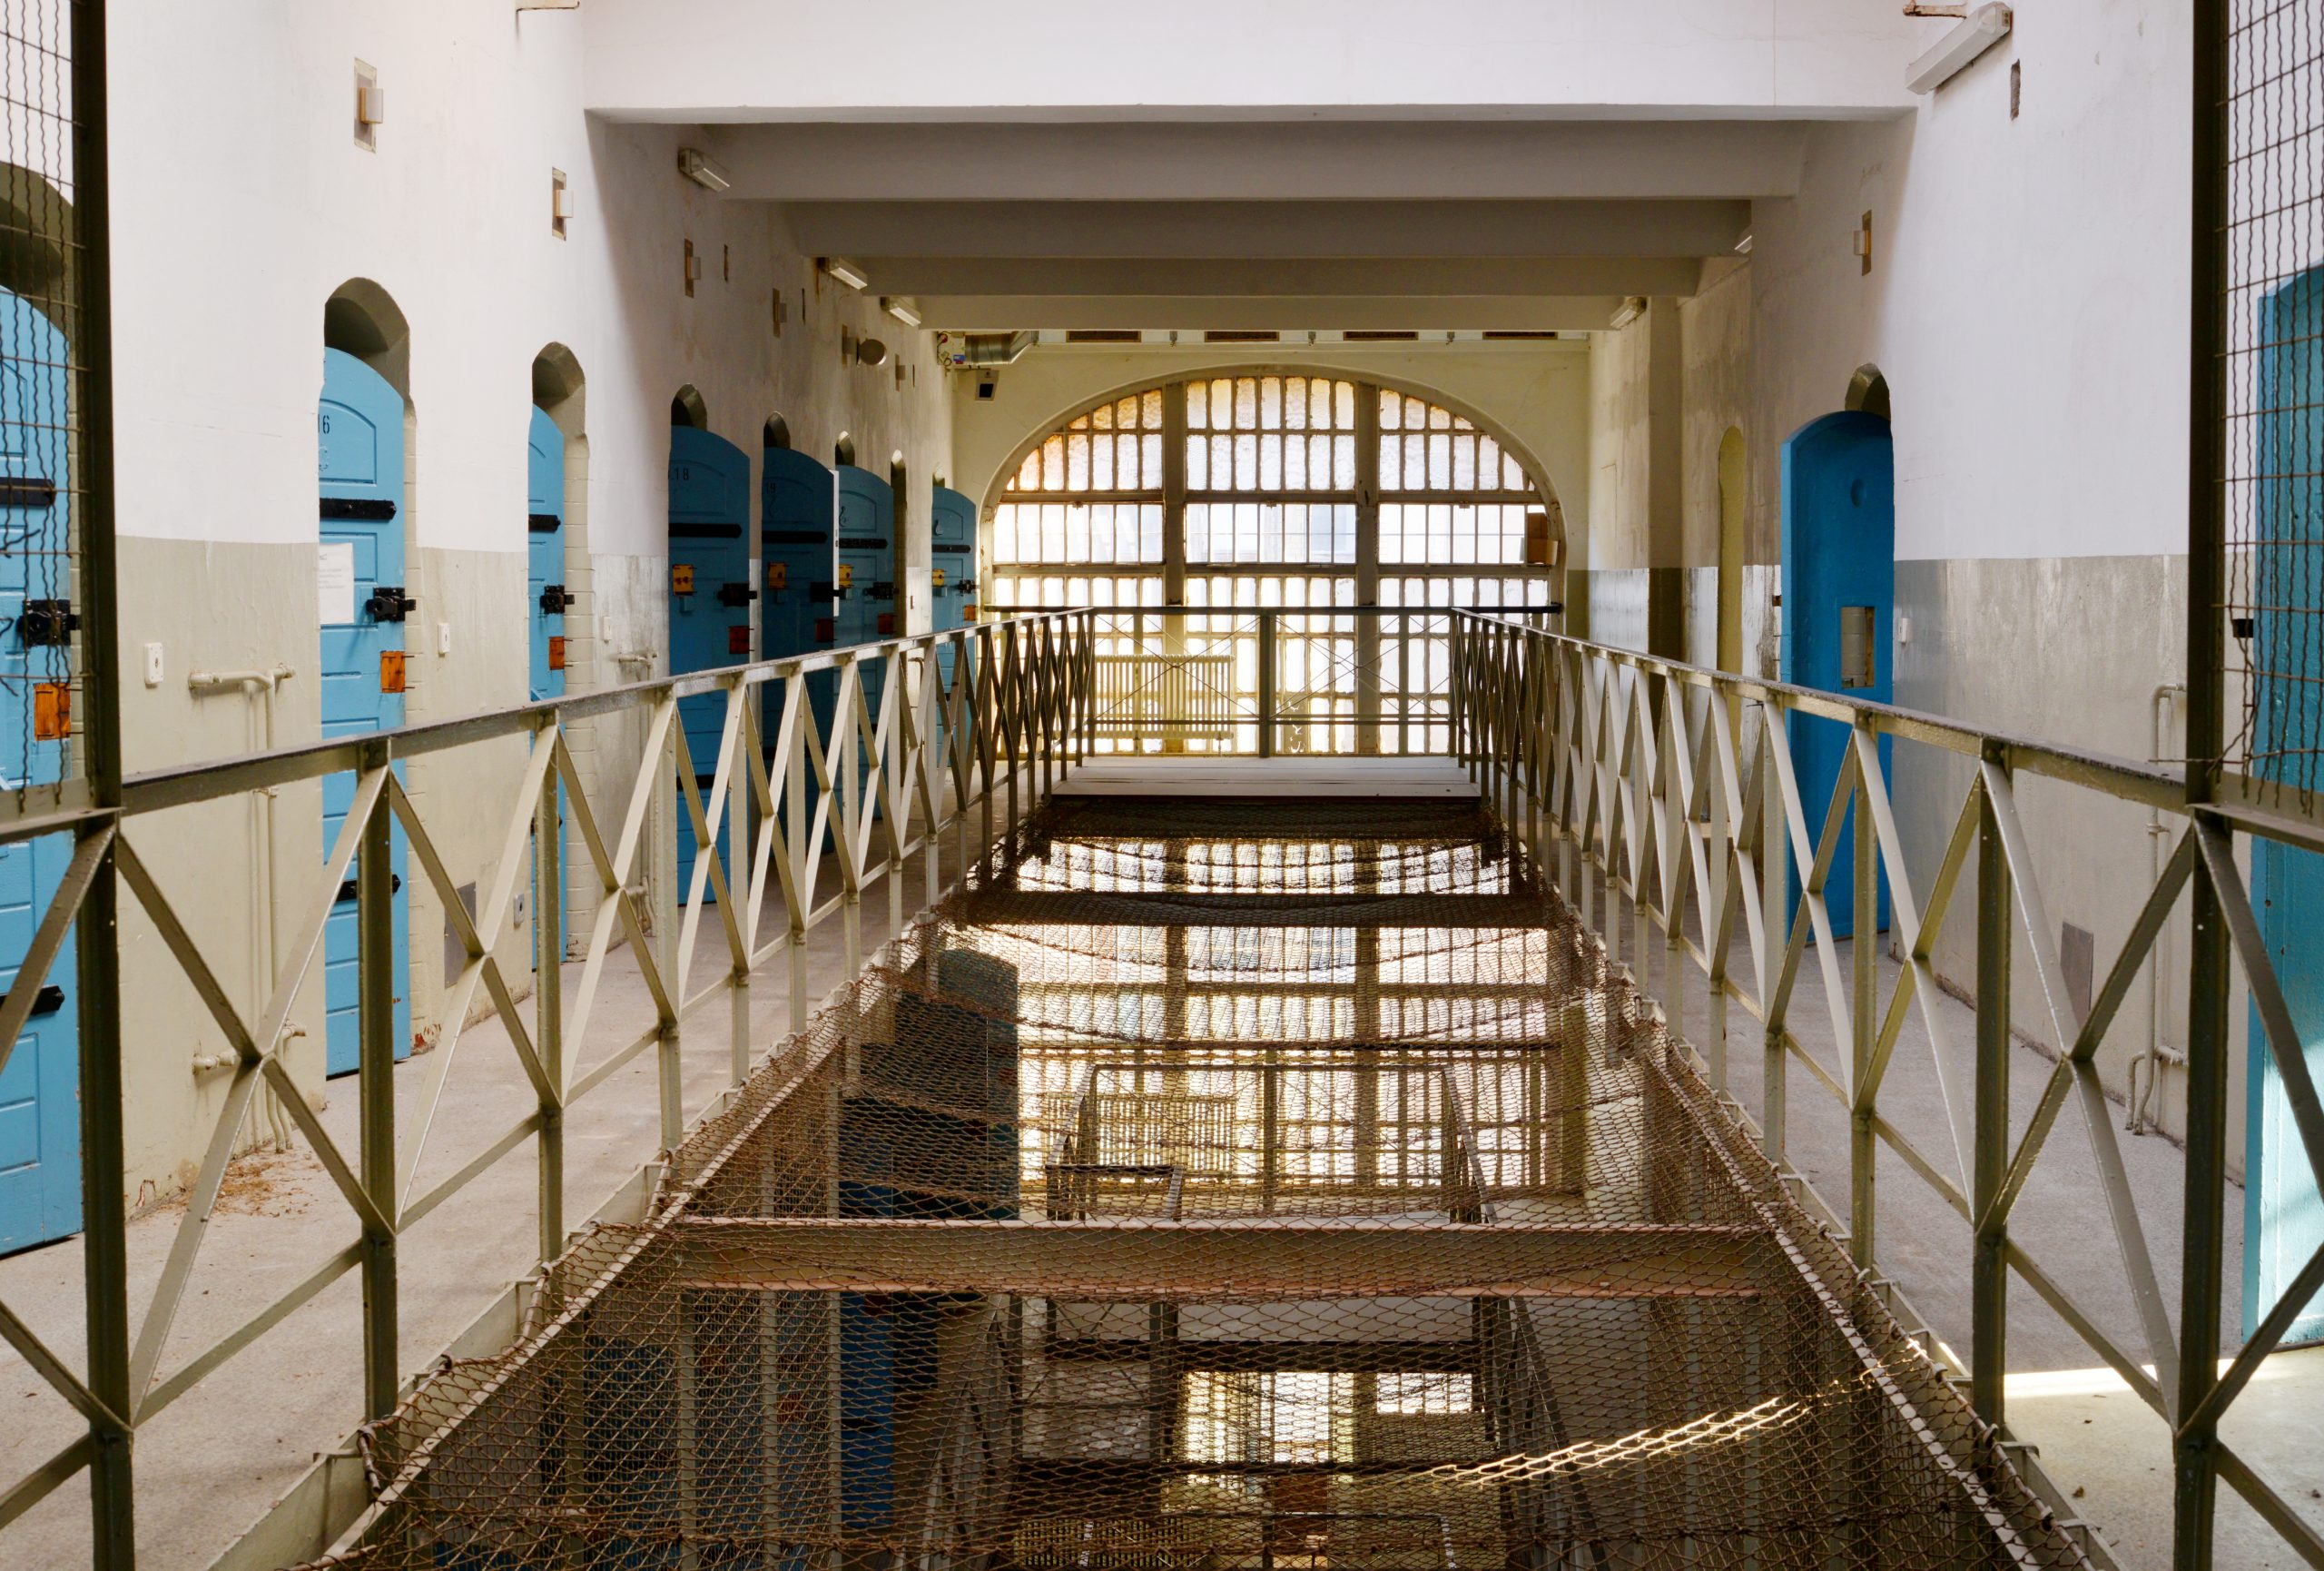 concours-surveillant-penitentiaire